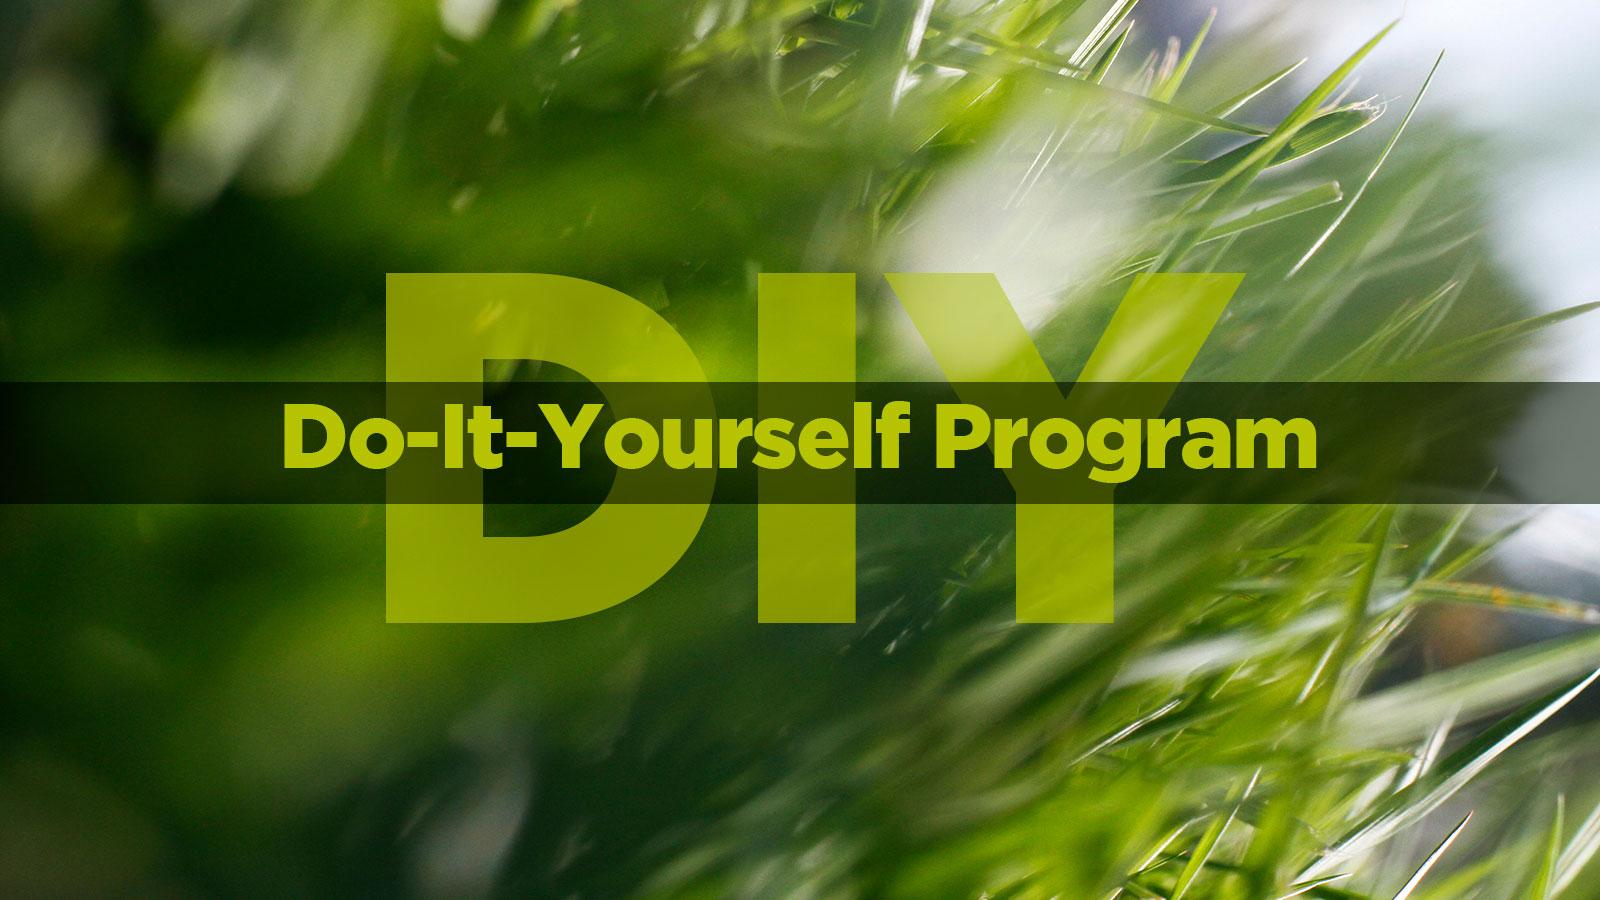 Do It Your Self : do it yourself program omaha organics diy lawn ~ Watch28wear.com Haus und Dekorationen